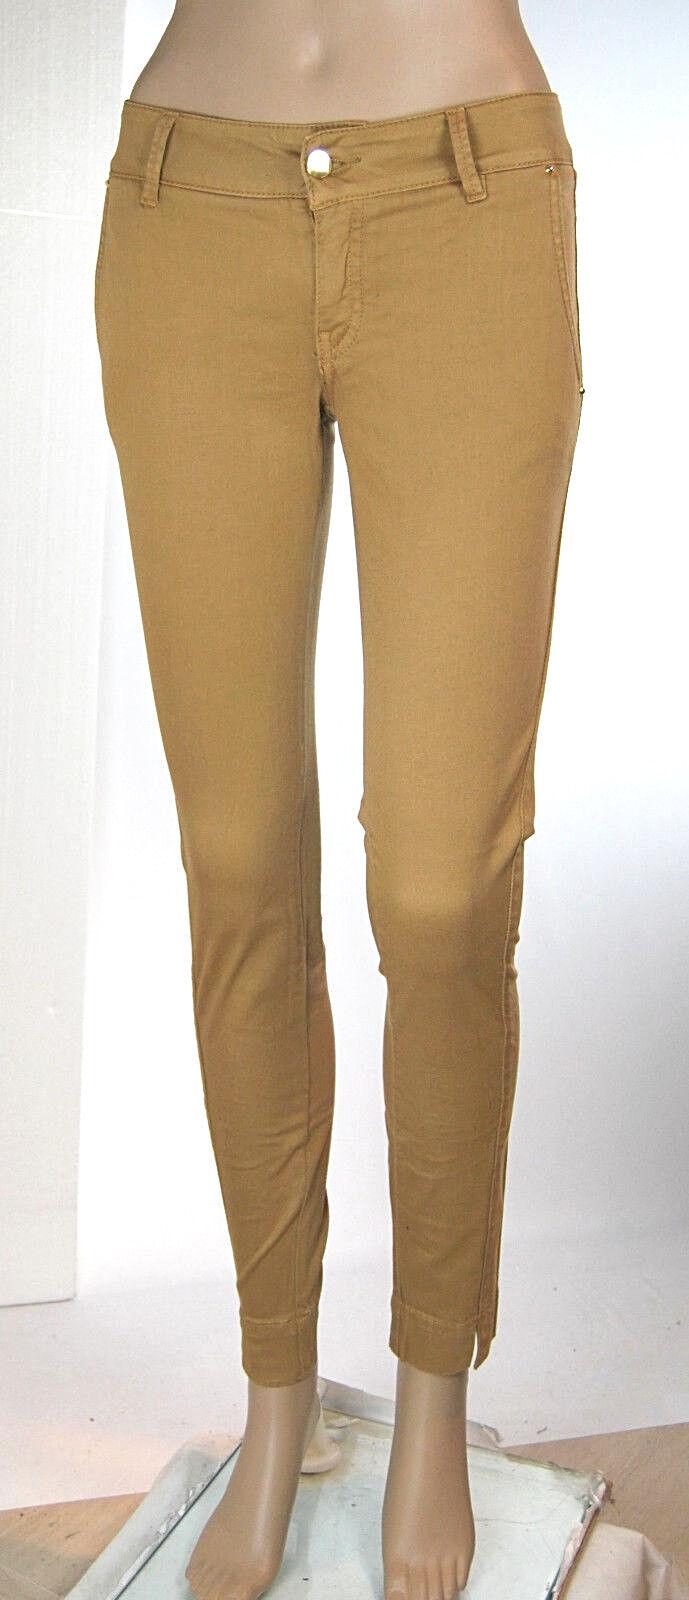 Pantaloni women Jeans MET Slim Fit Made in  C875 Tg 25 29